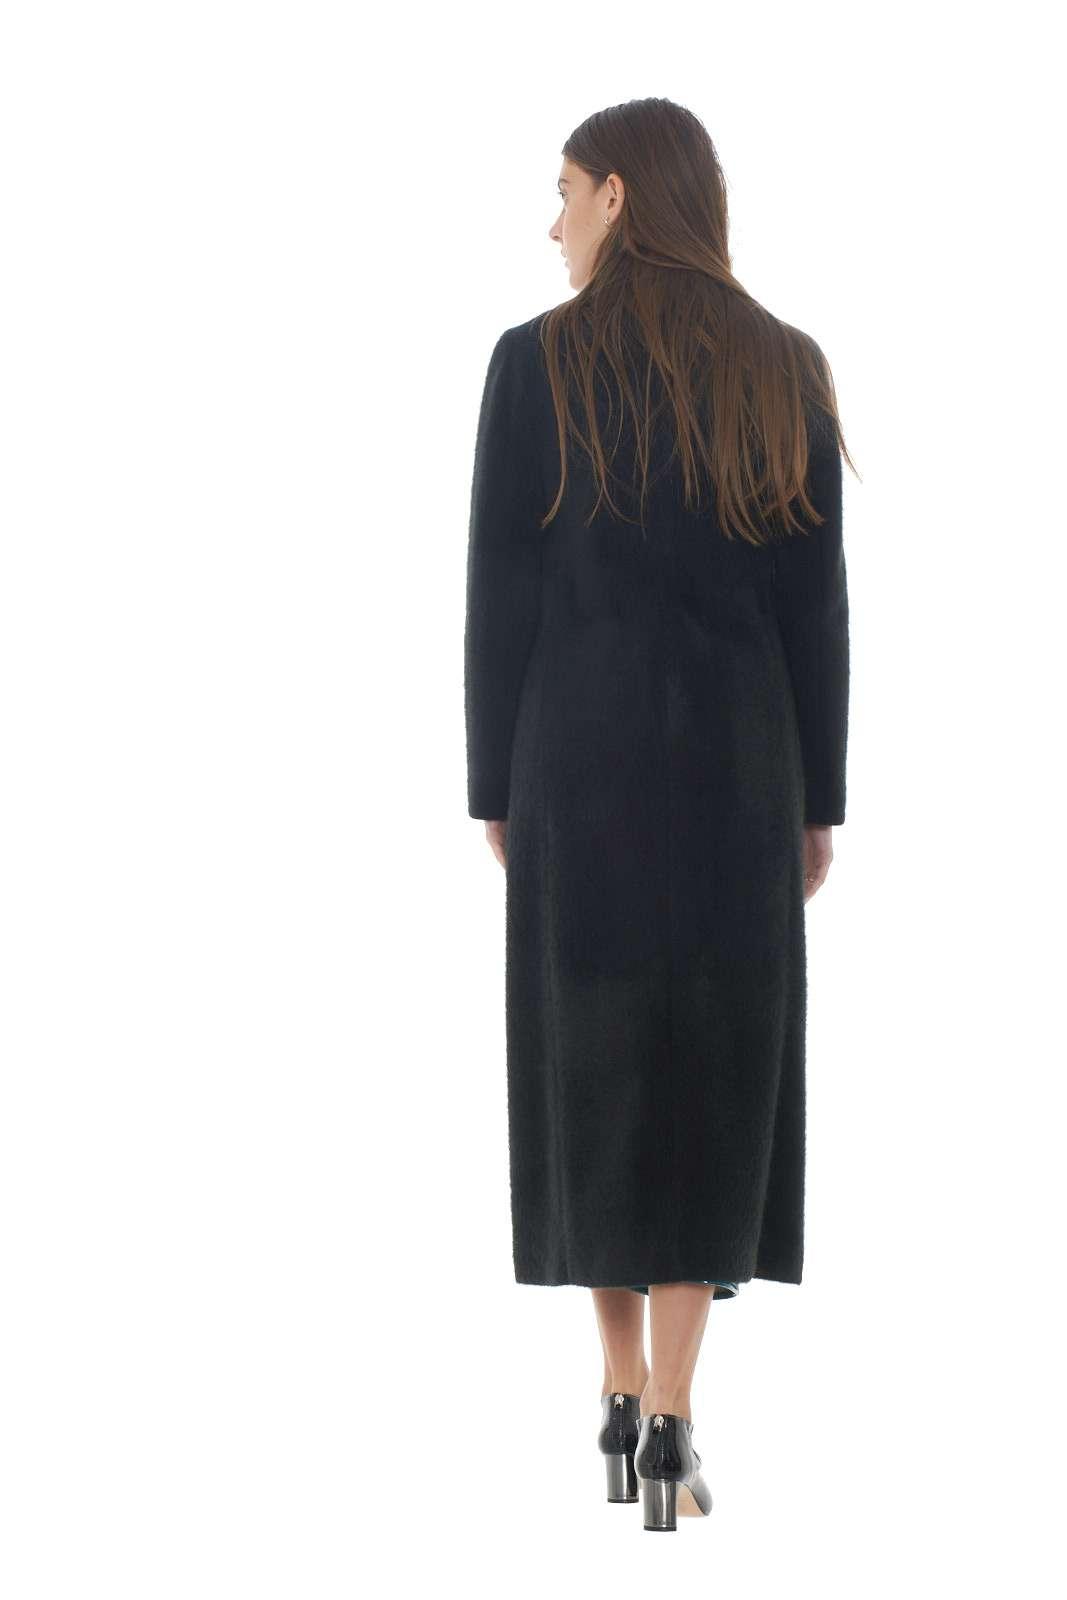 https://www.parmax.com/media/catalog/product/a/i/AI-outlet_parmax-cappotto-donna-Patrizia-Pepe-2S1261-C.jpg